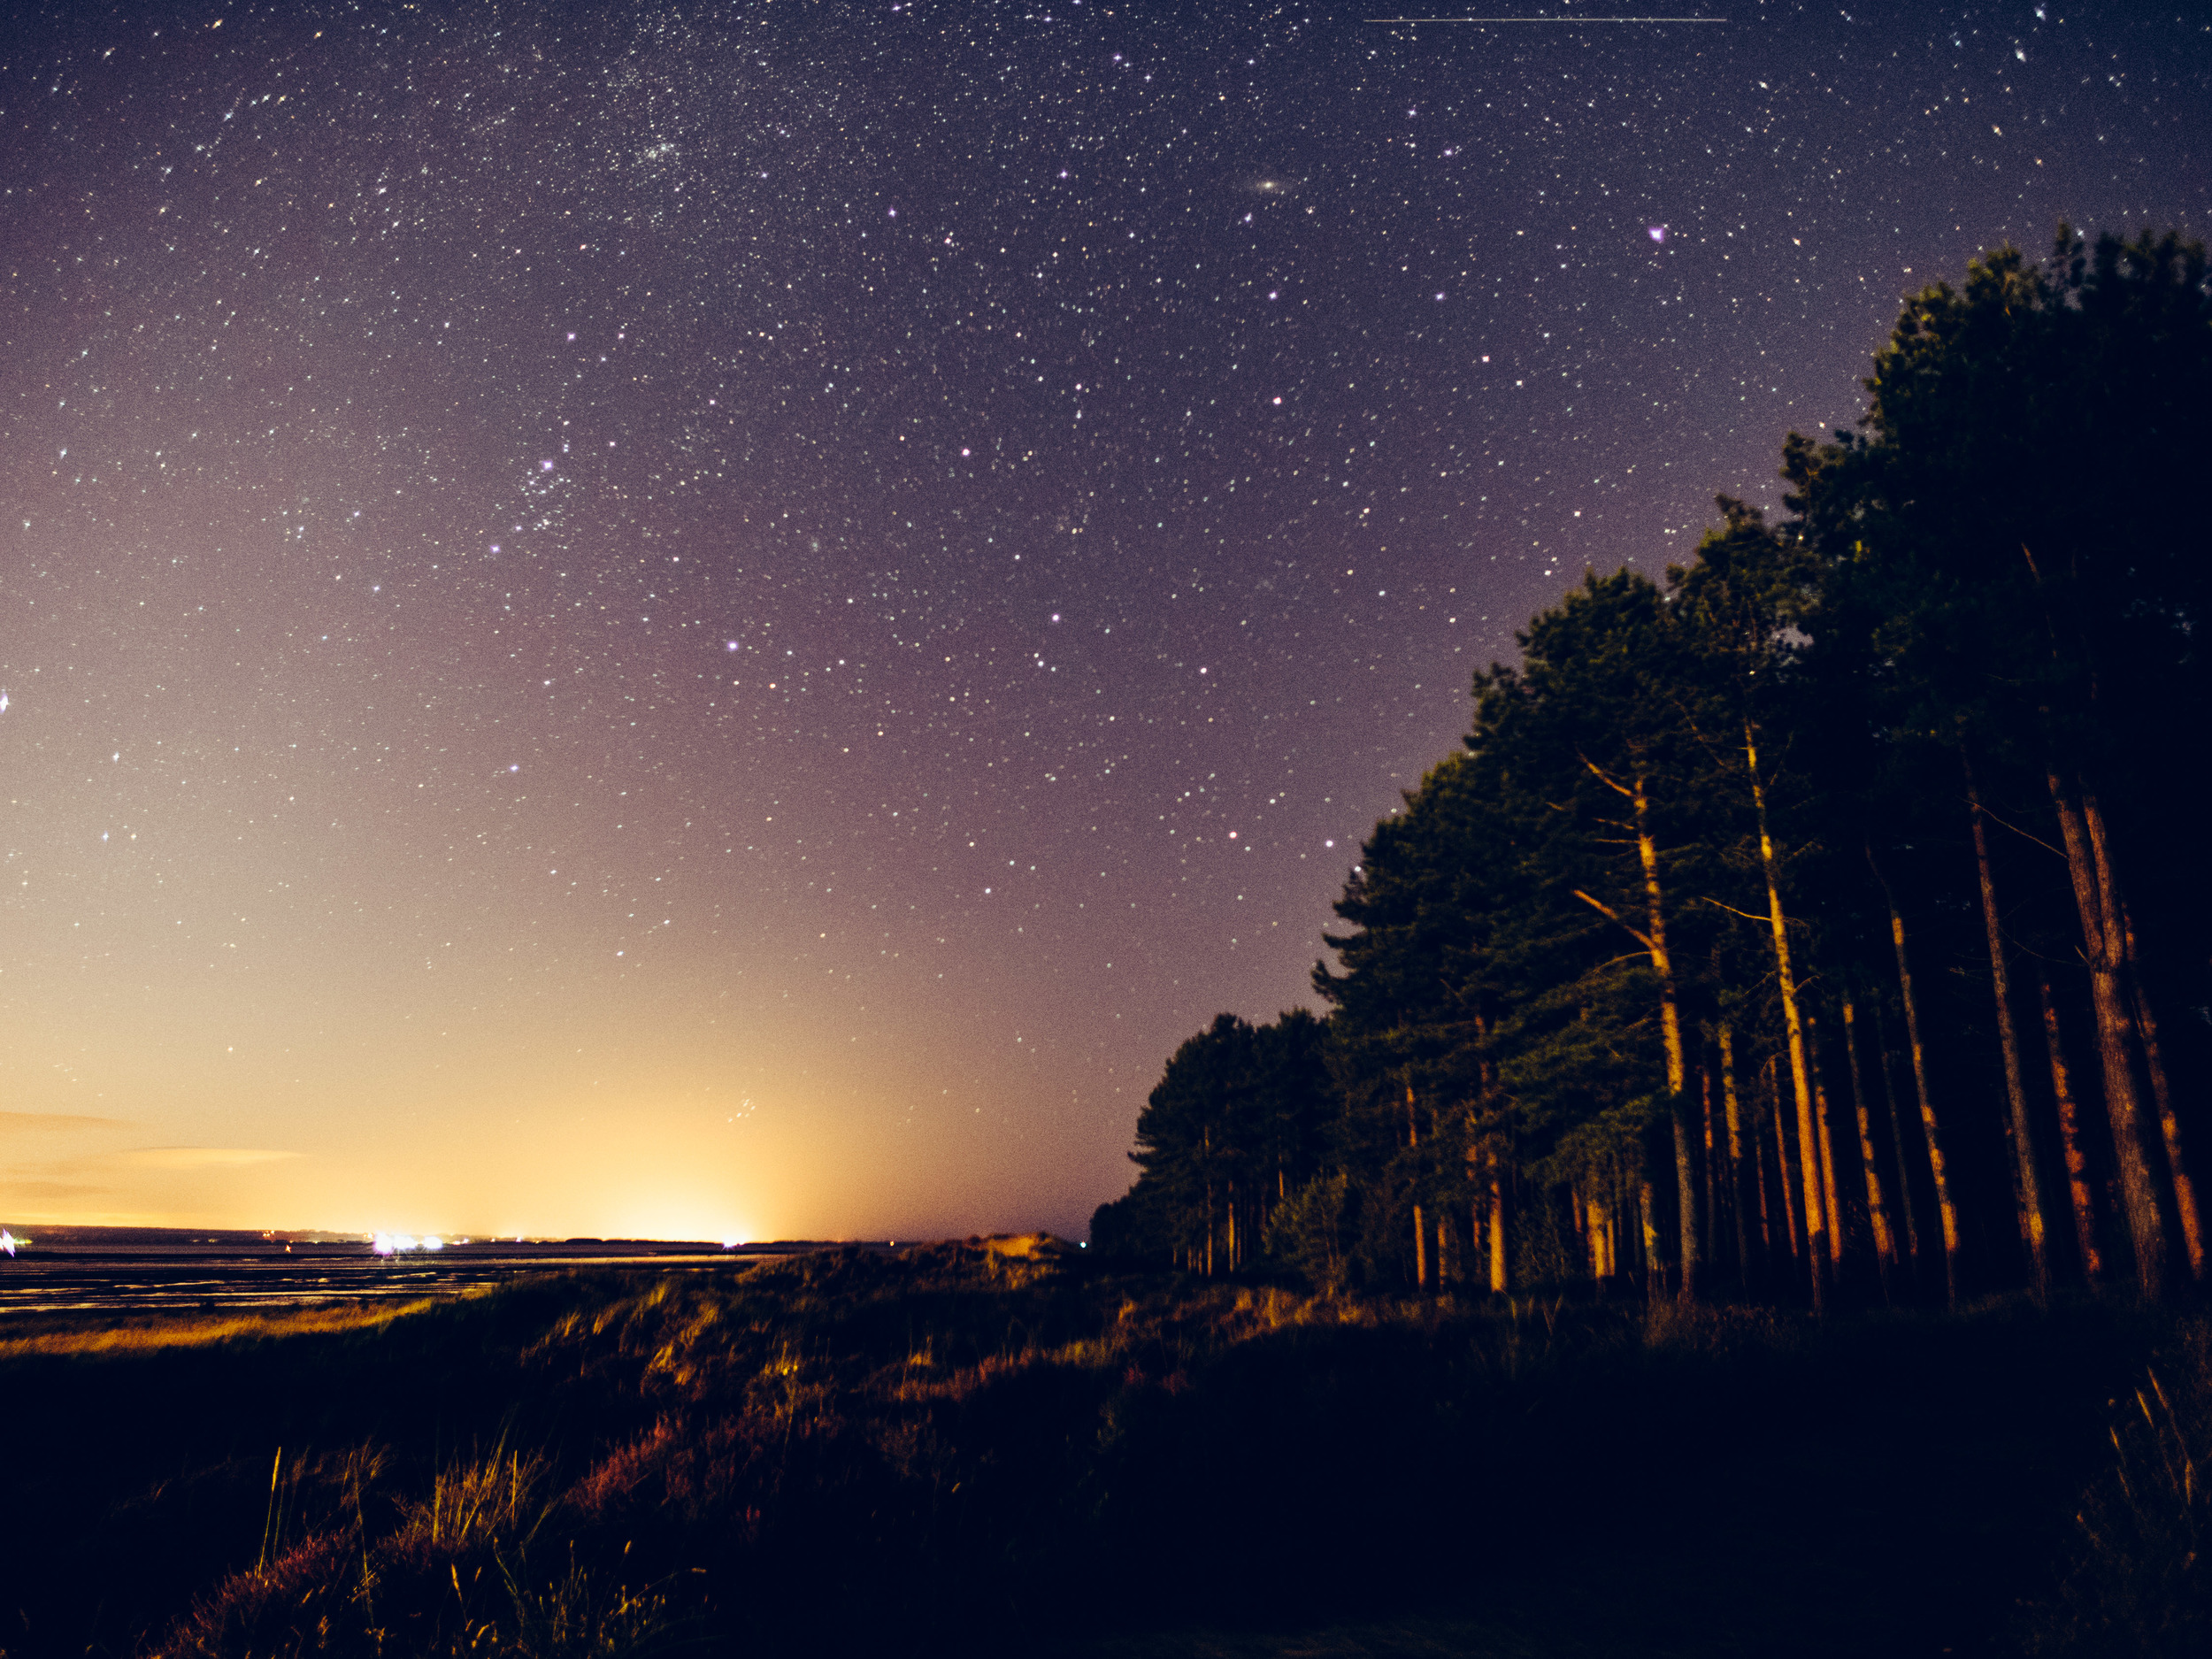 Amazing views despite a little light pollution.